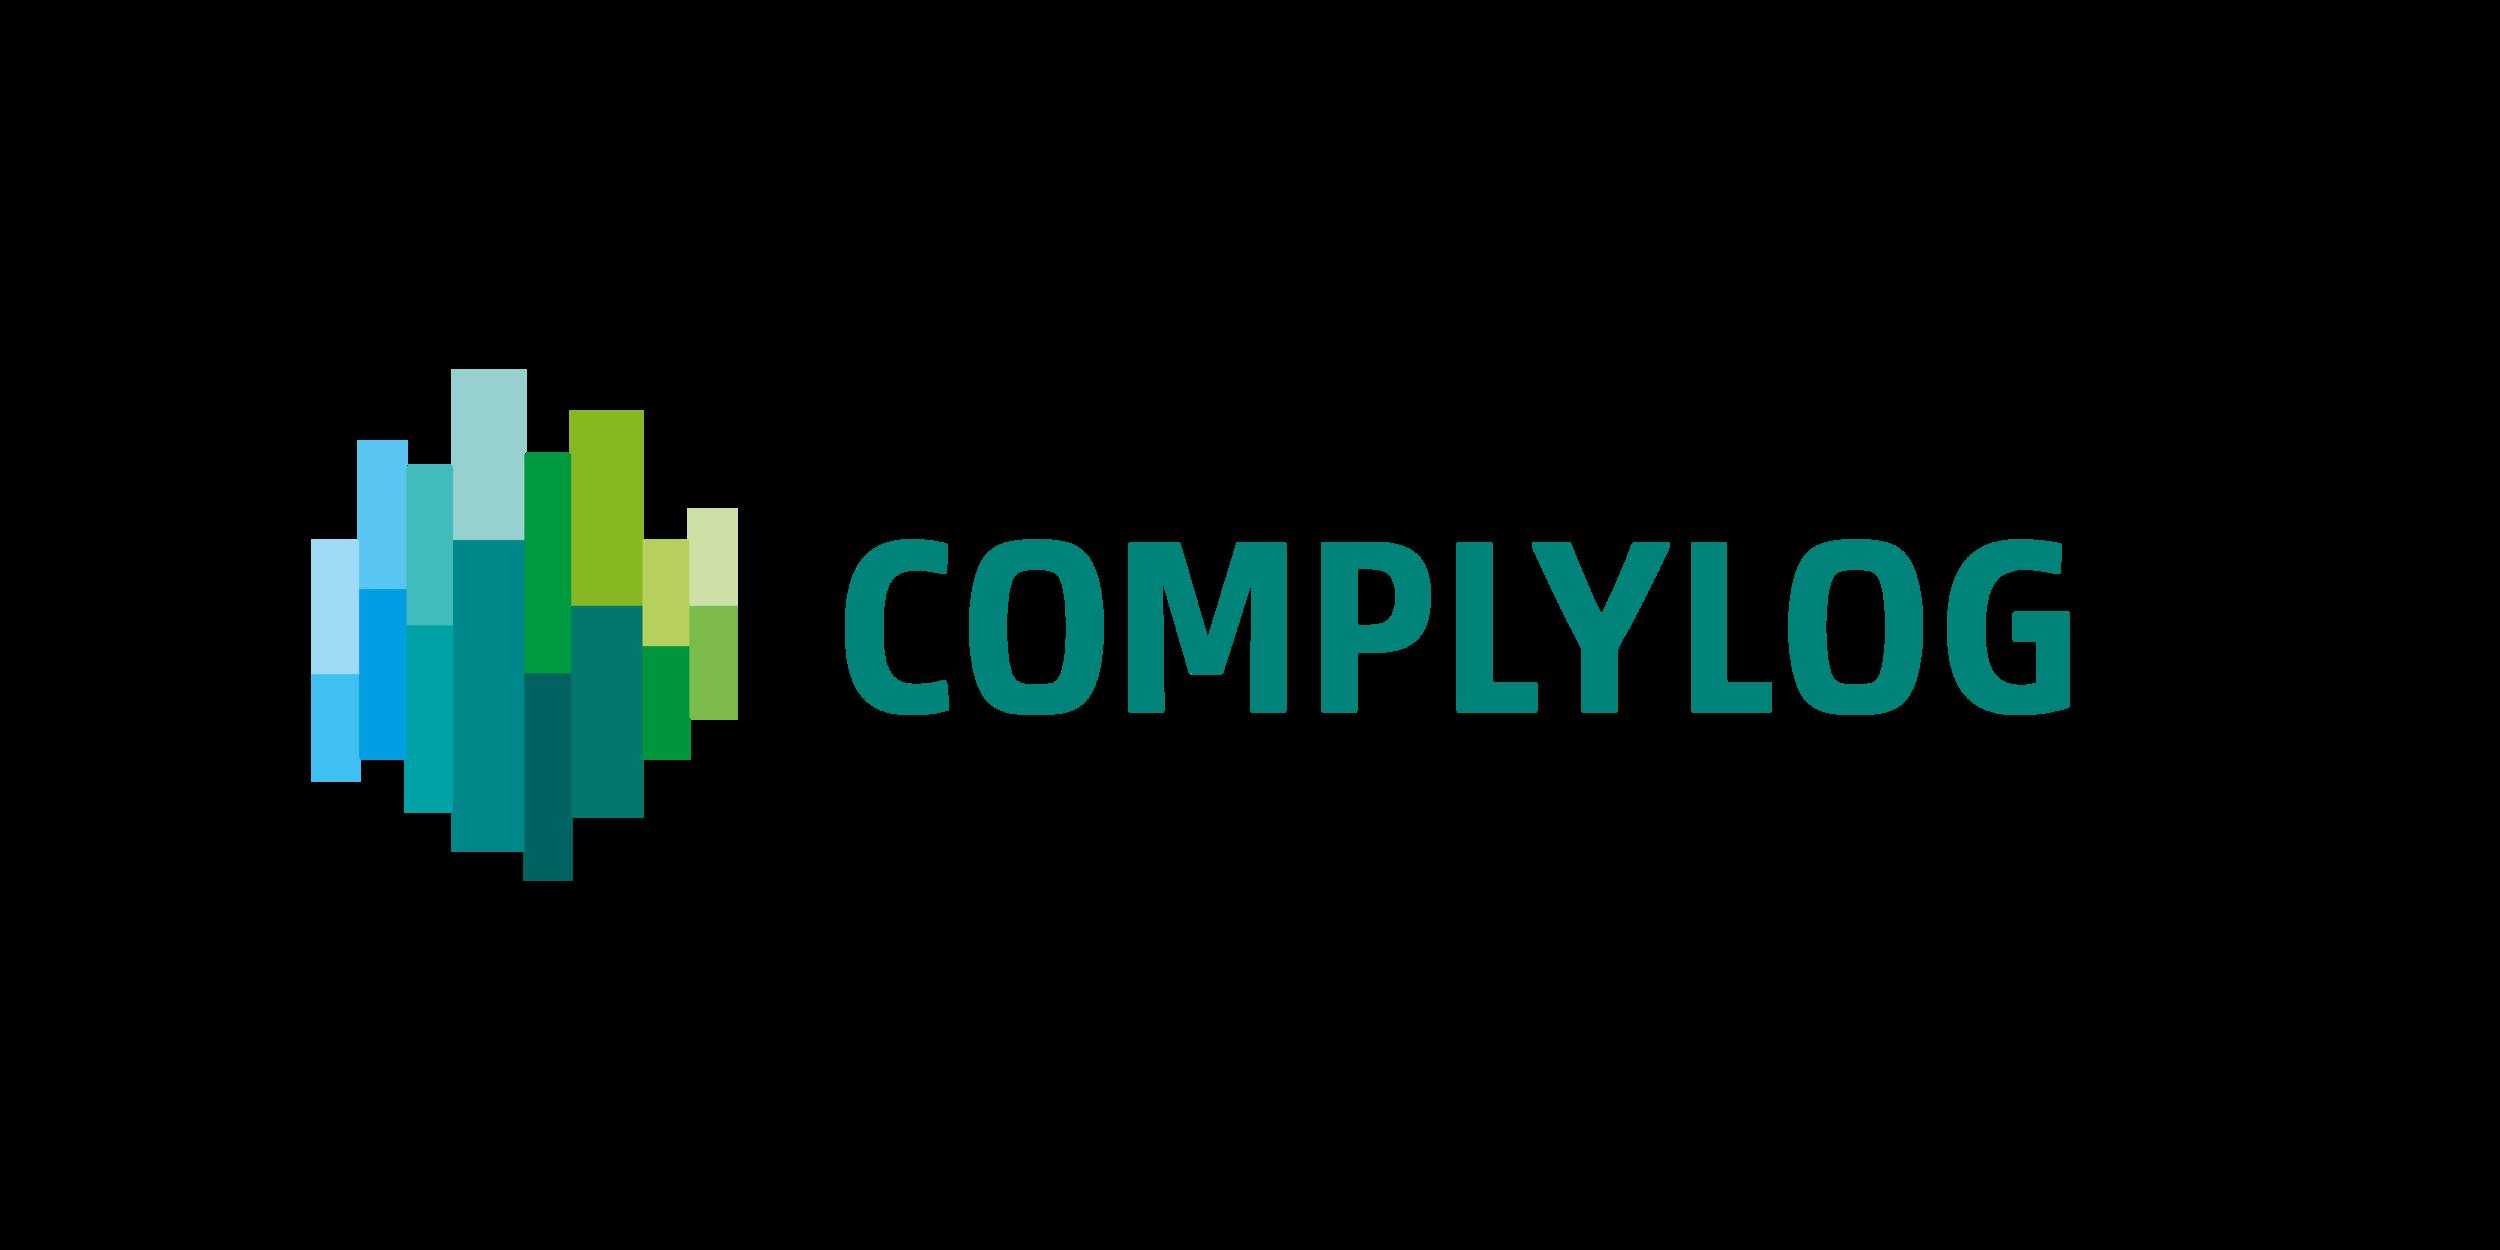 complylog.png